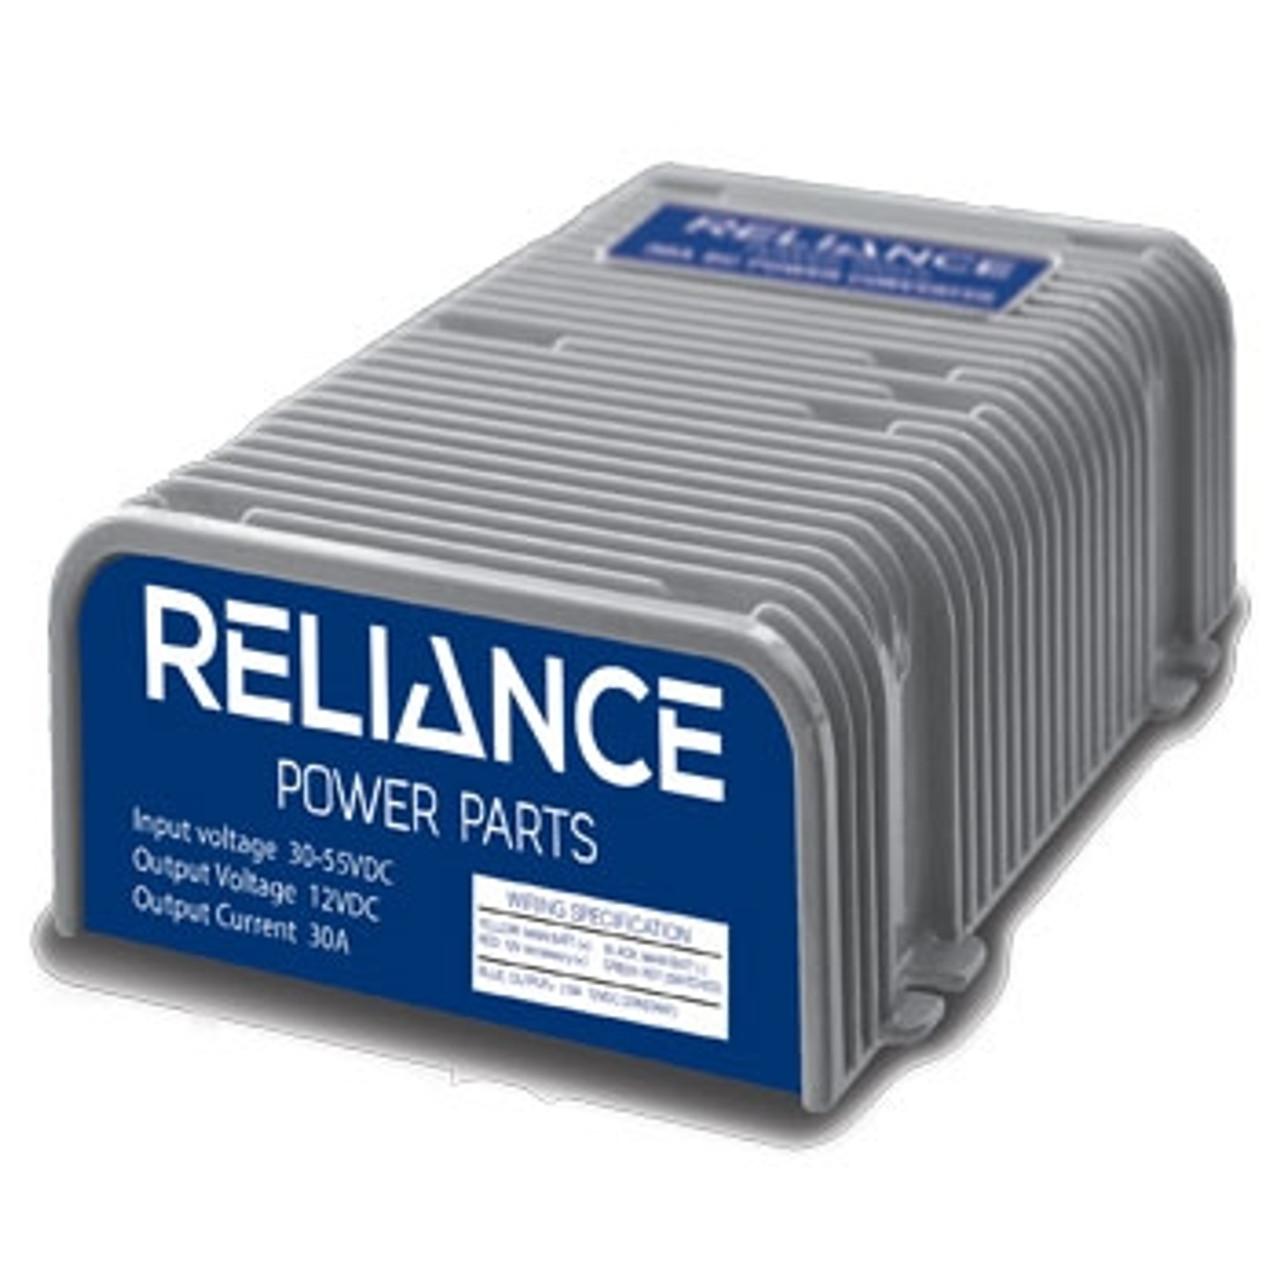 12 Volt Converter >> Reliance 36 Or 48 Volt To 12 Volt Dc Converter 30 Amp